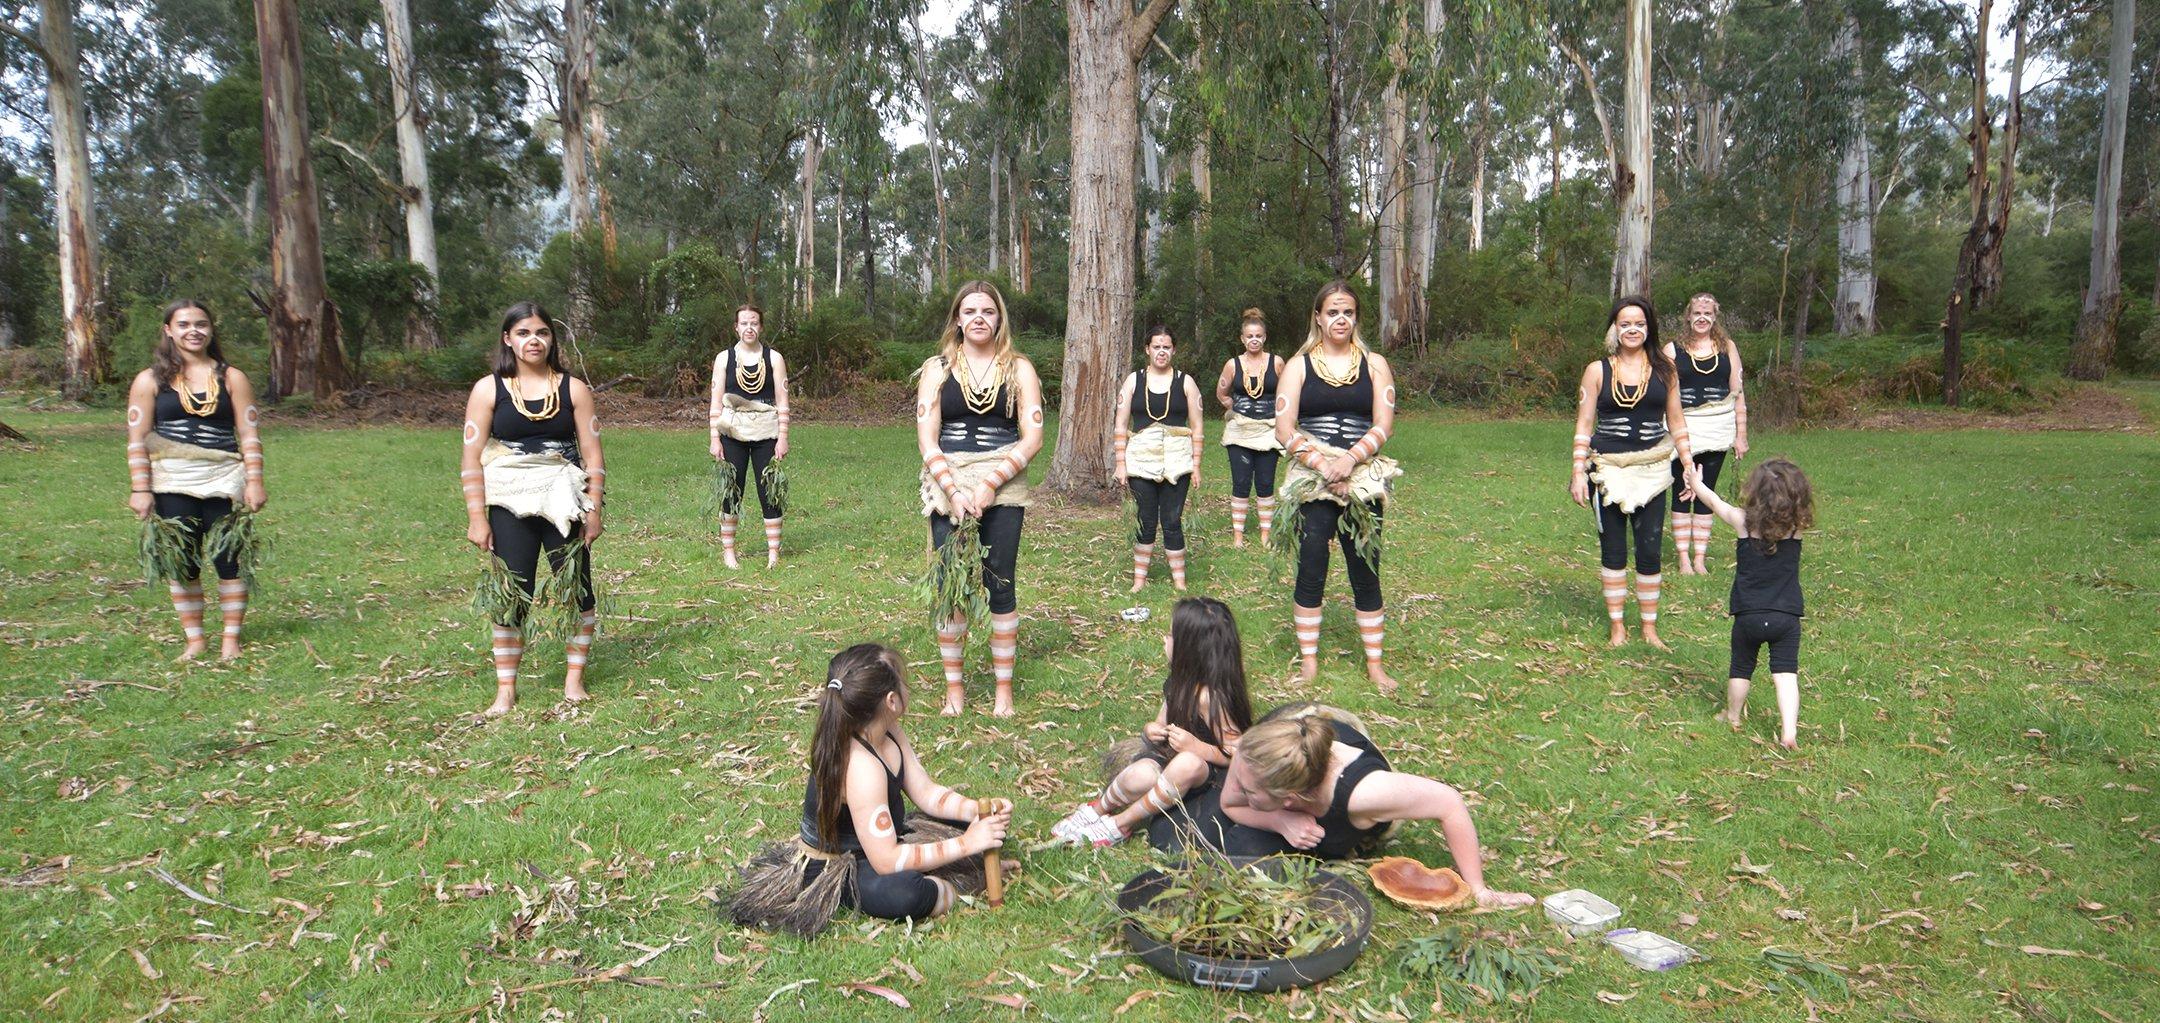 Djirri Djirri Dance Group, Courtesy Mandy Nicholson - hero image